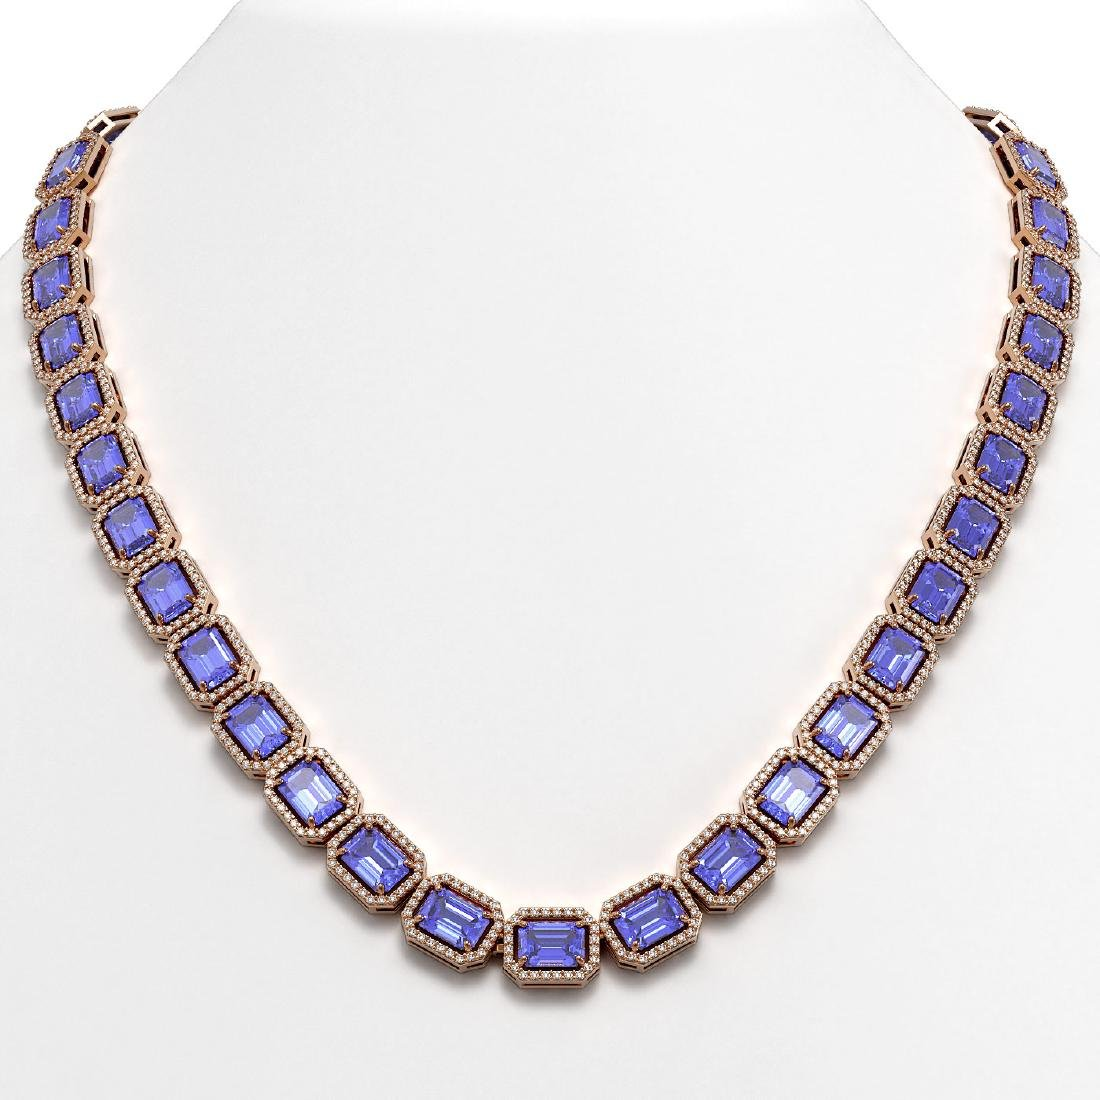 56.69 CTW Tanzanite & Diamond Halo Necklace 10K Rose